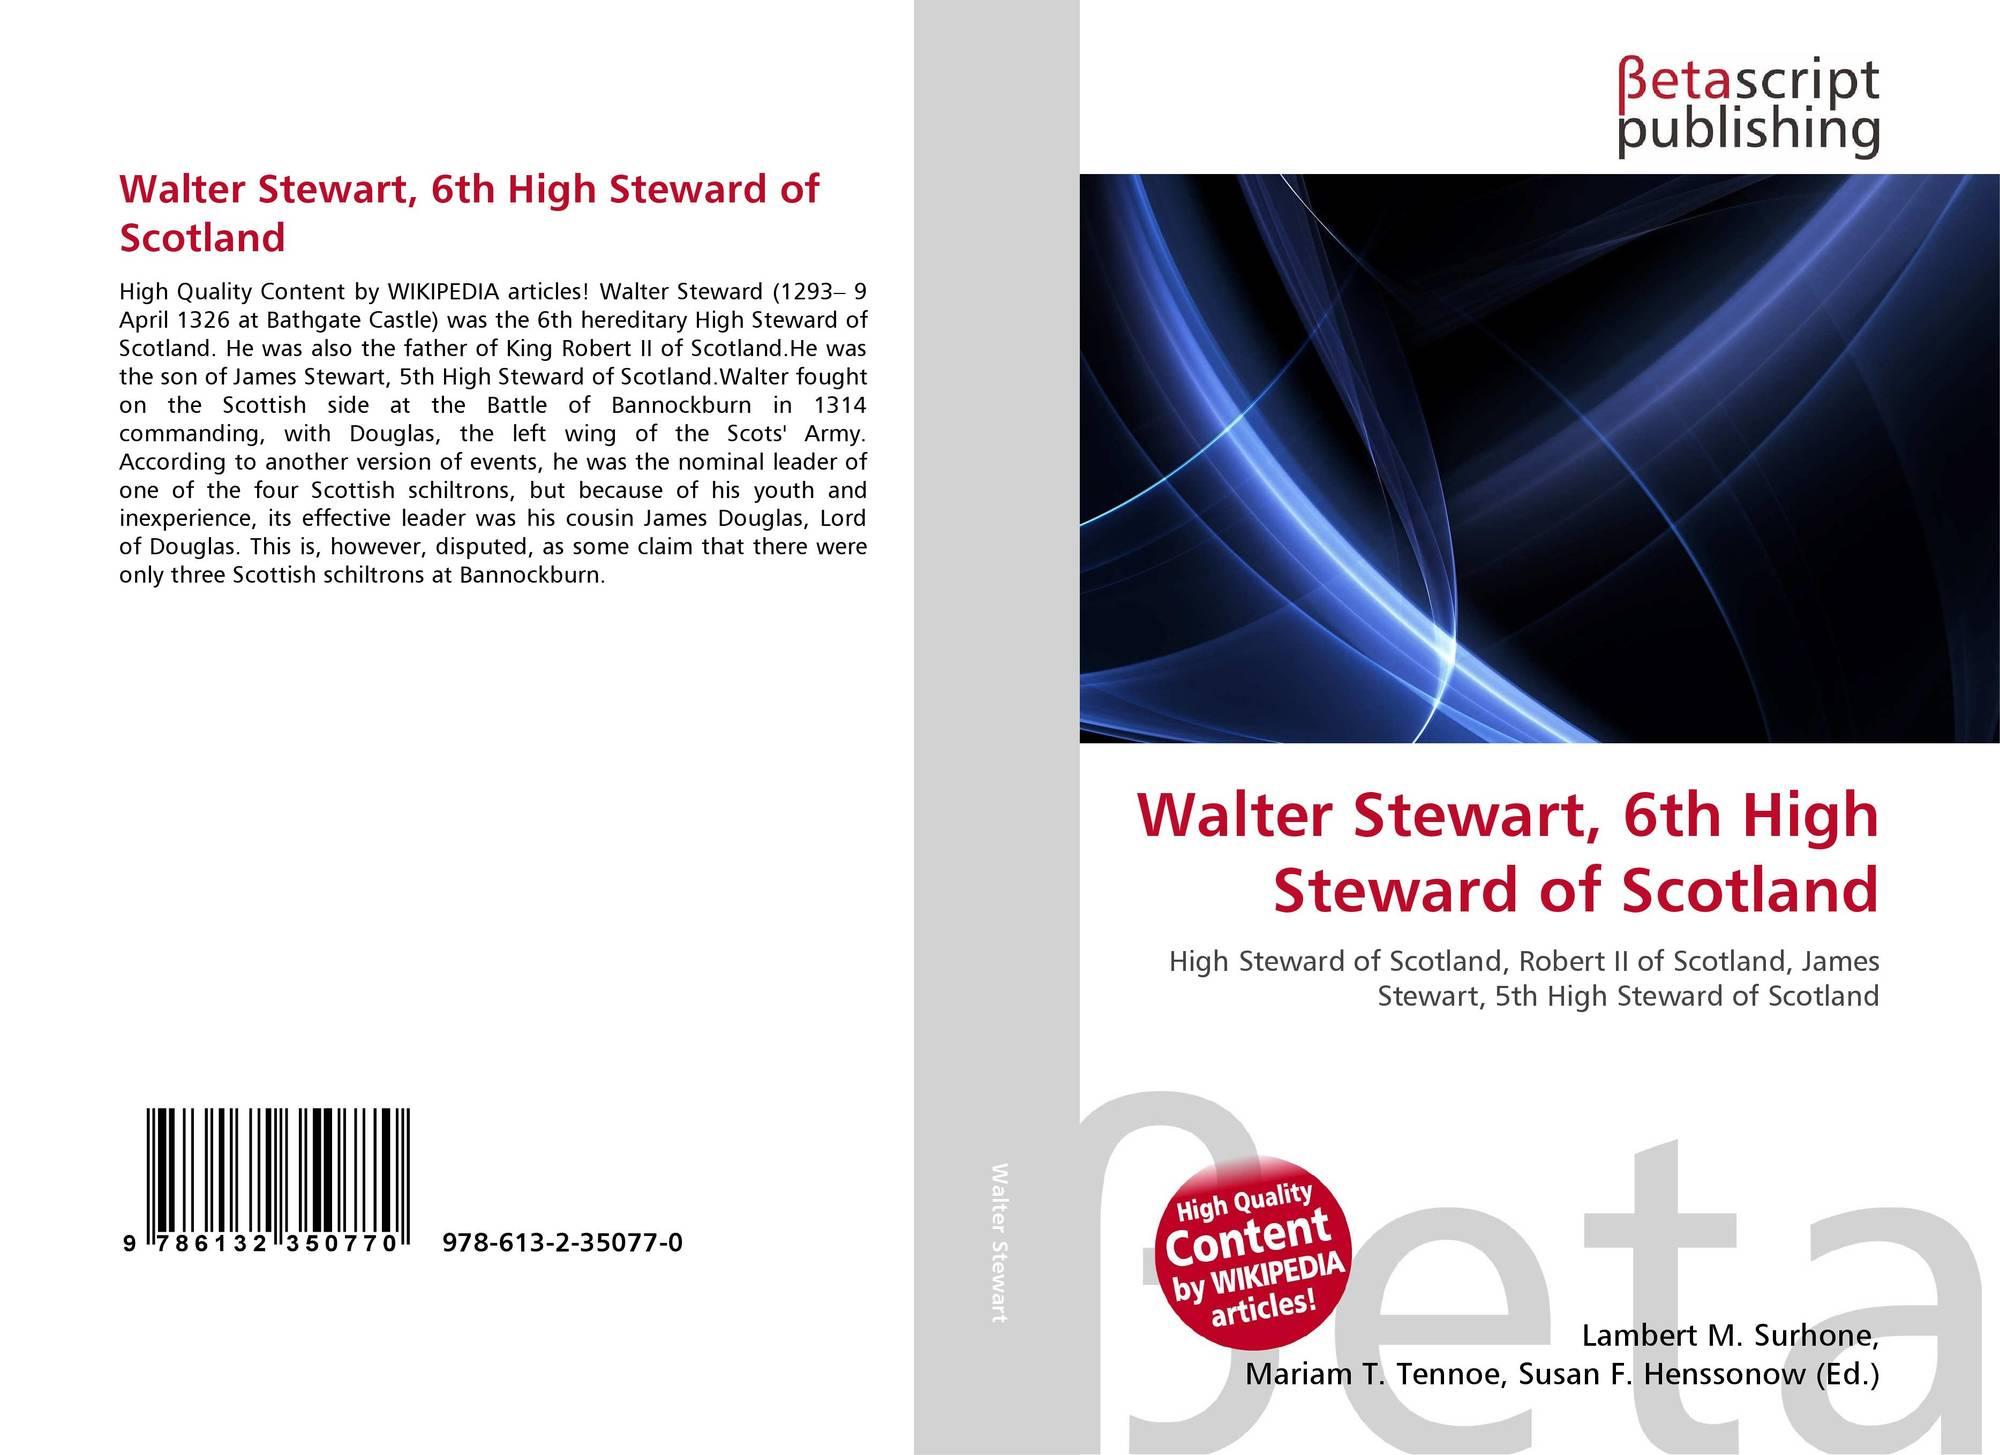 Walter Stewart, 6th High Steward of Scotland, 978-613-2-35077-0 ...